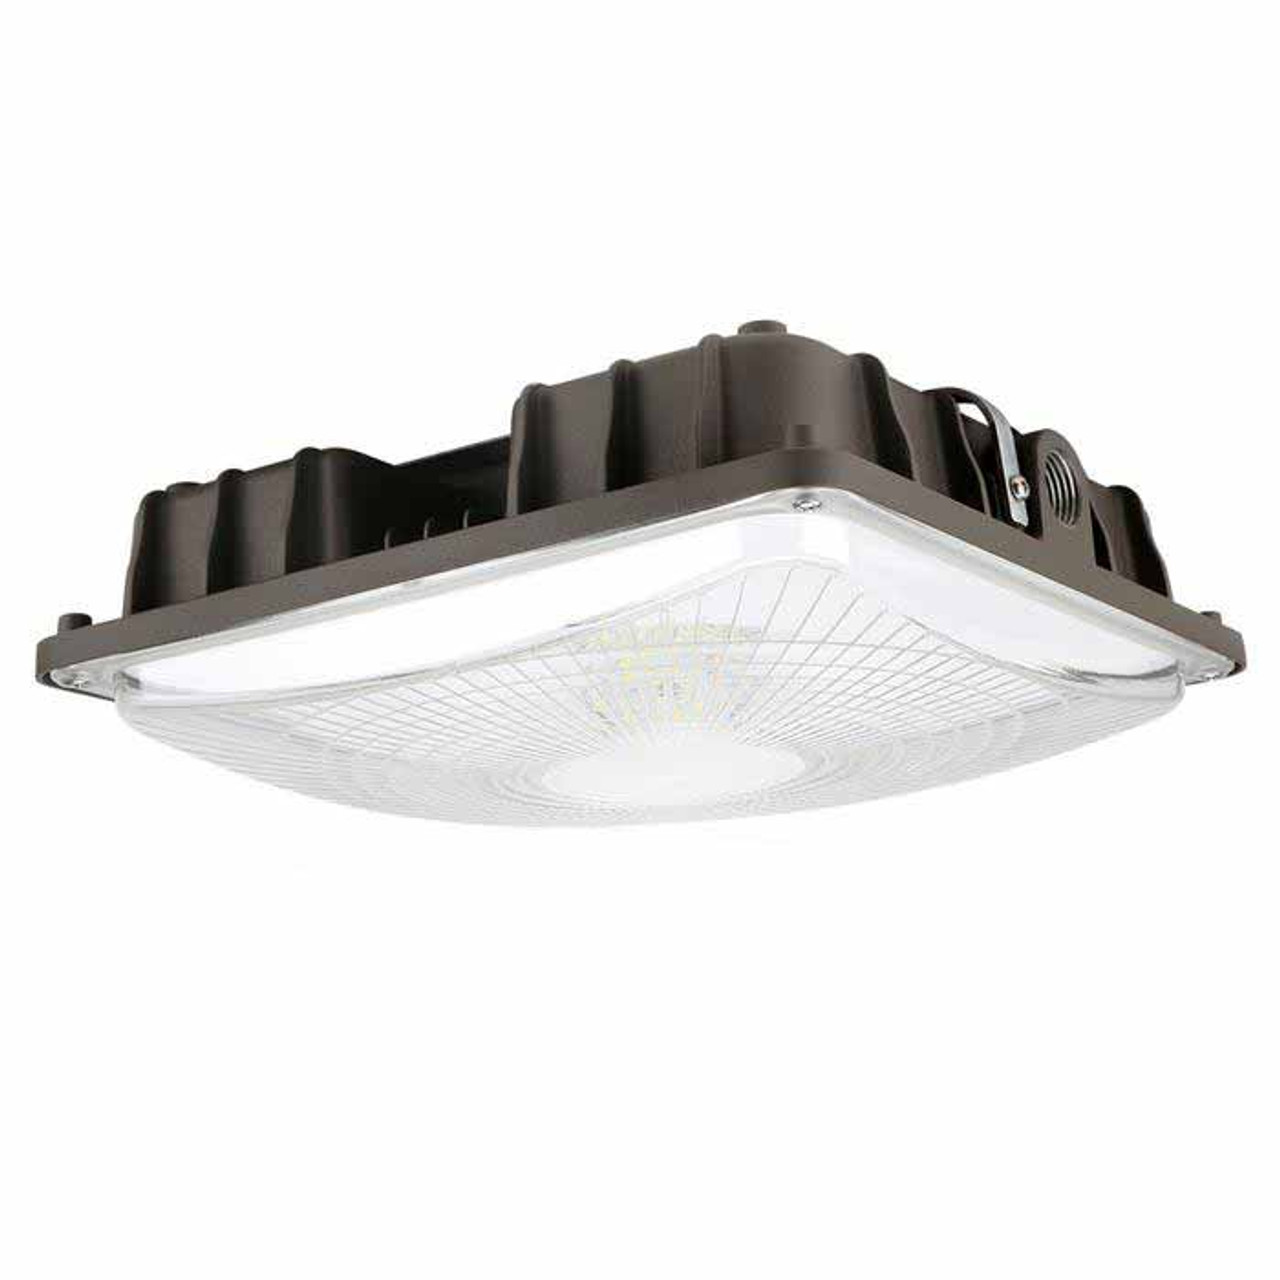 40 Watt LED Canopy Light